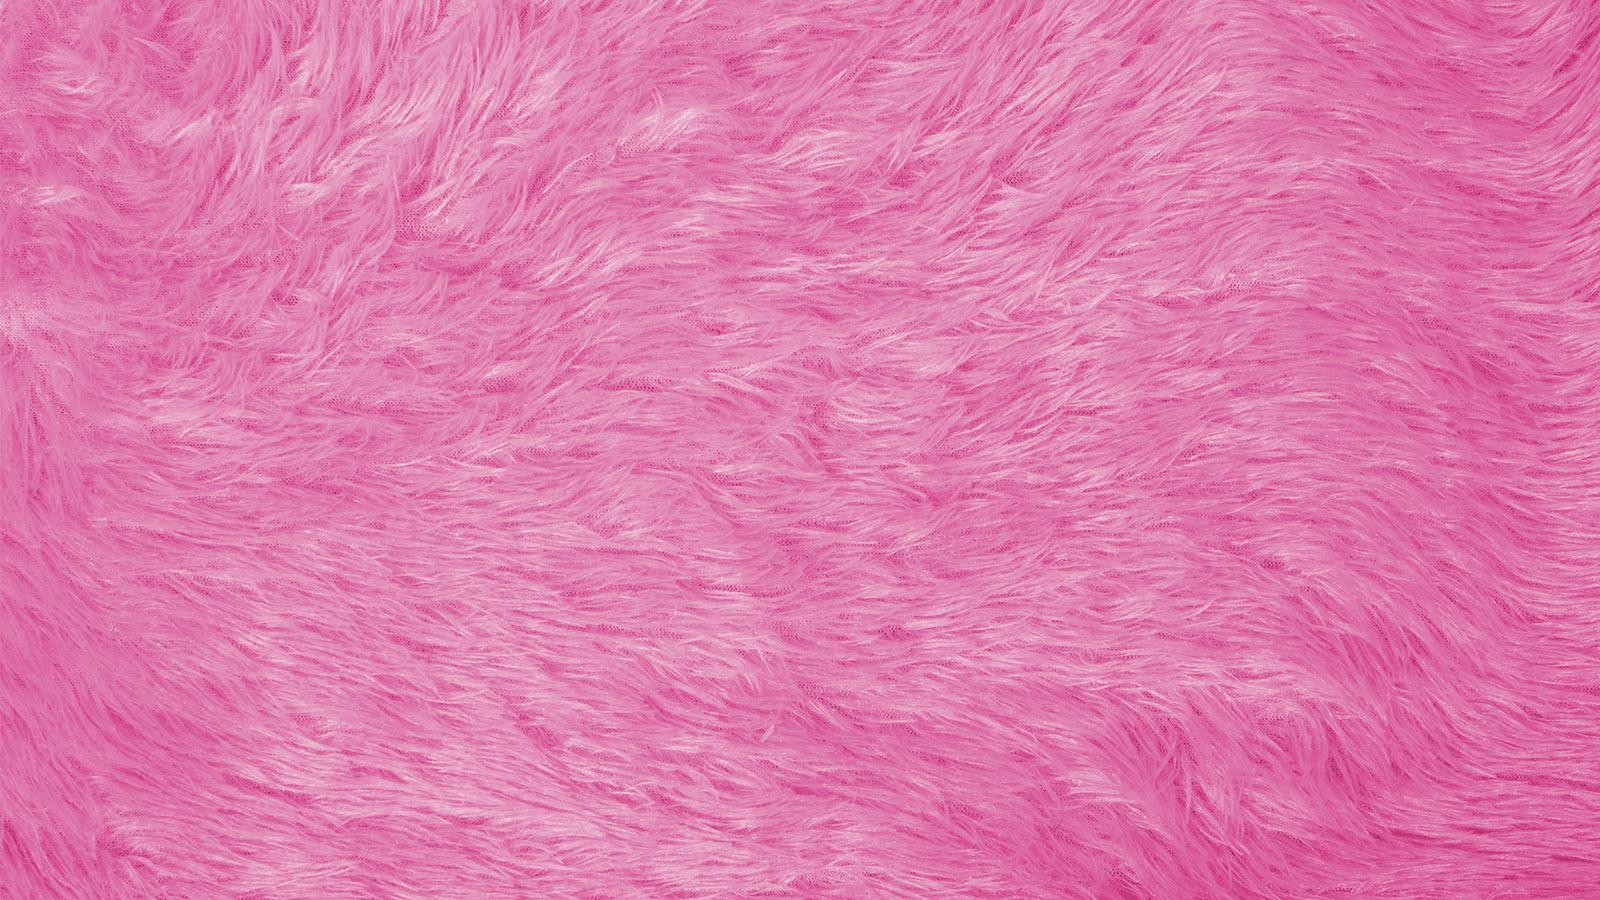 Pink fur 1600x900